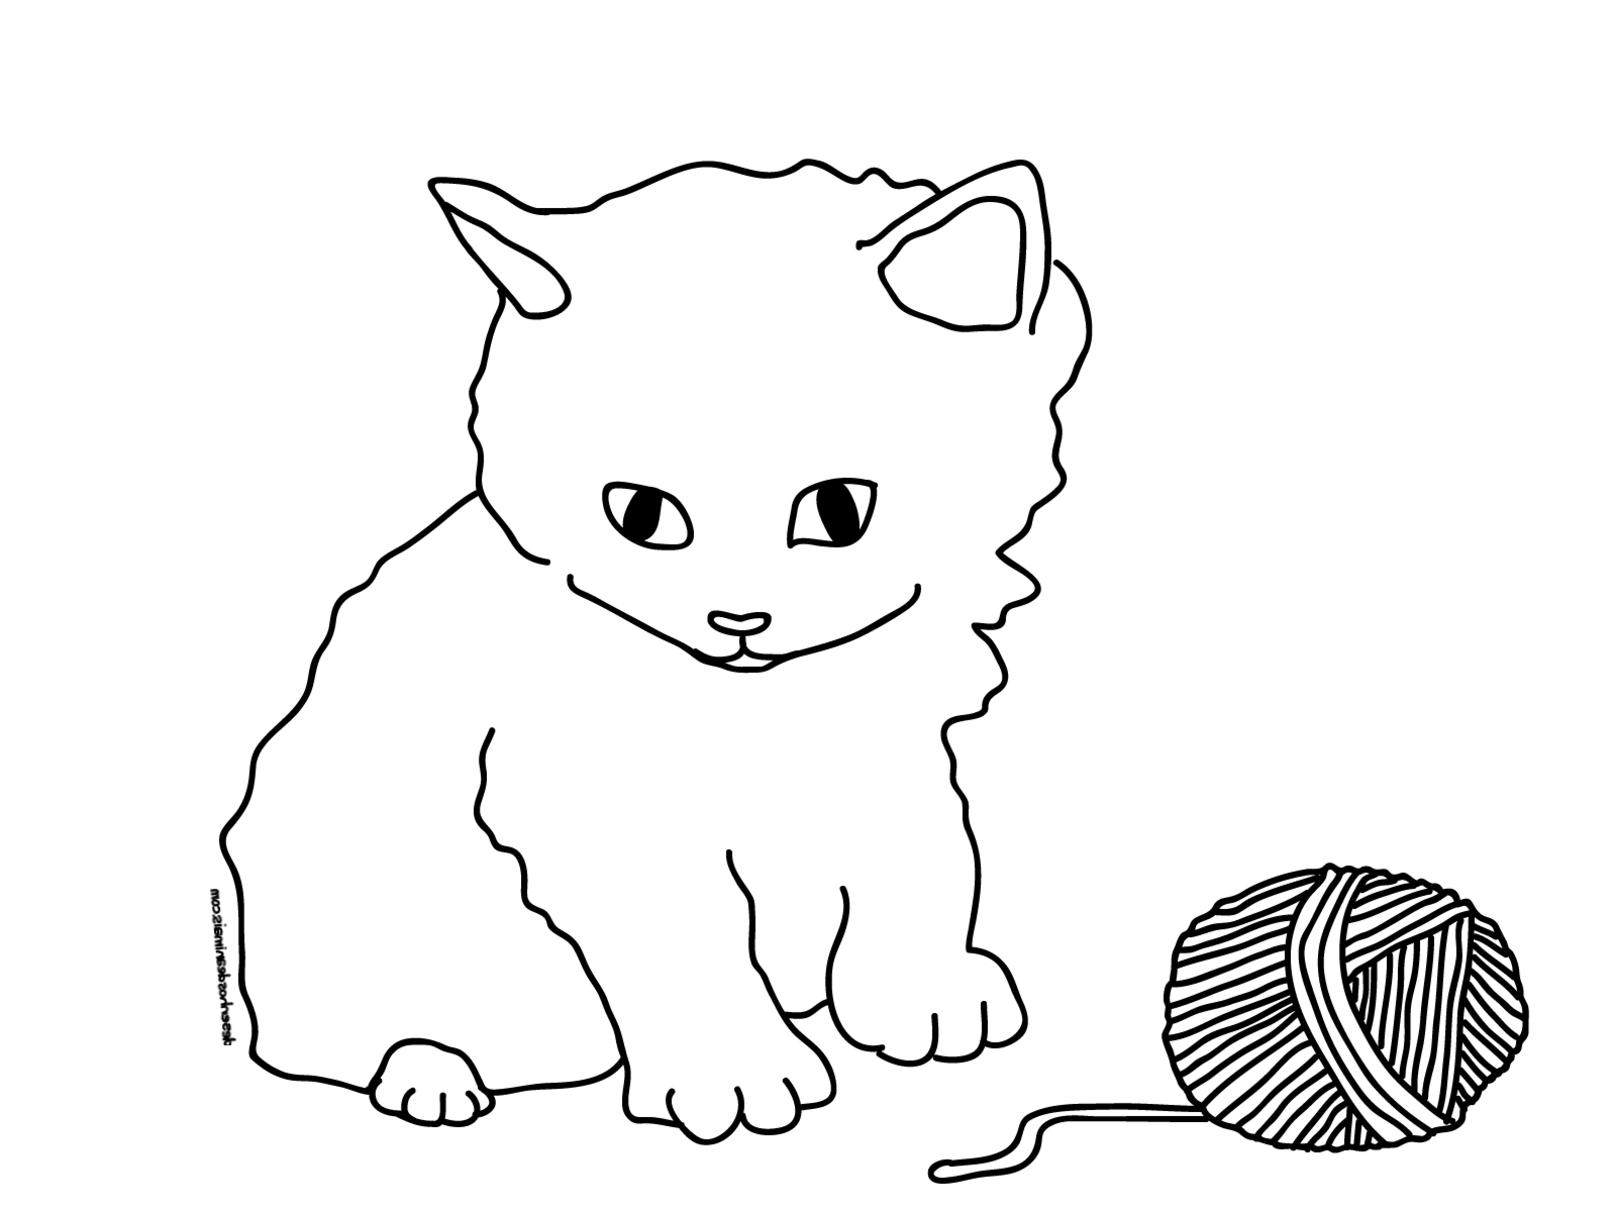 Baby Katzen Ausmalbilder : Ausmalbilder Katzen Zum Ausdrucken 125 Malvorlage Katzen